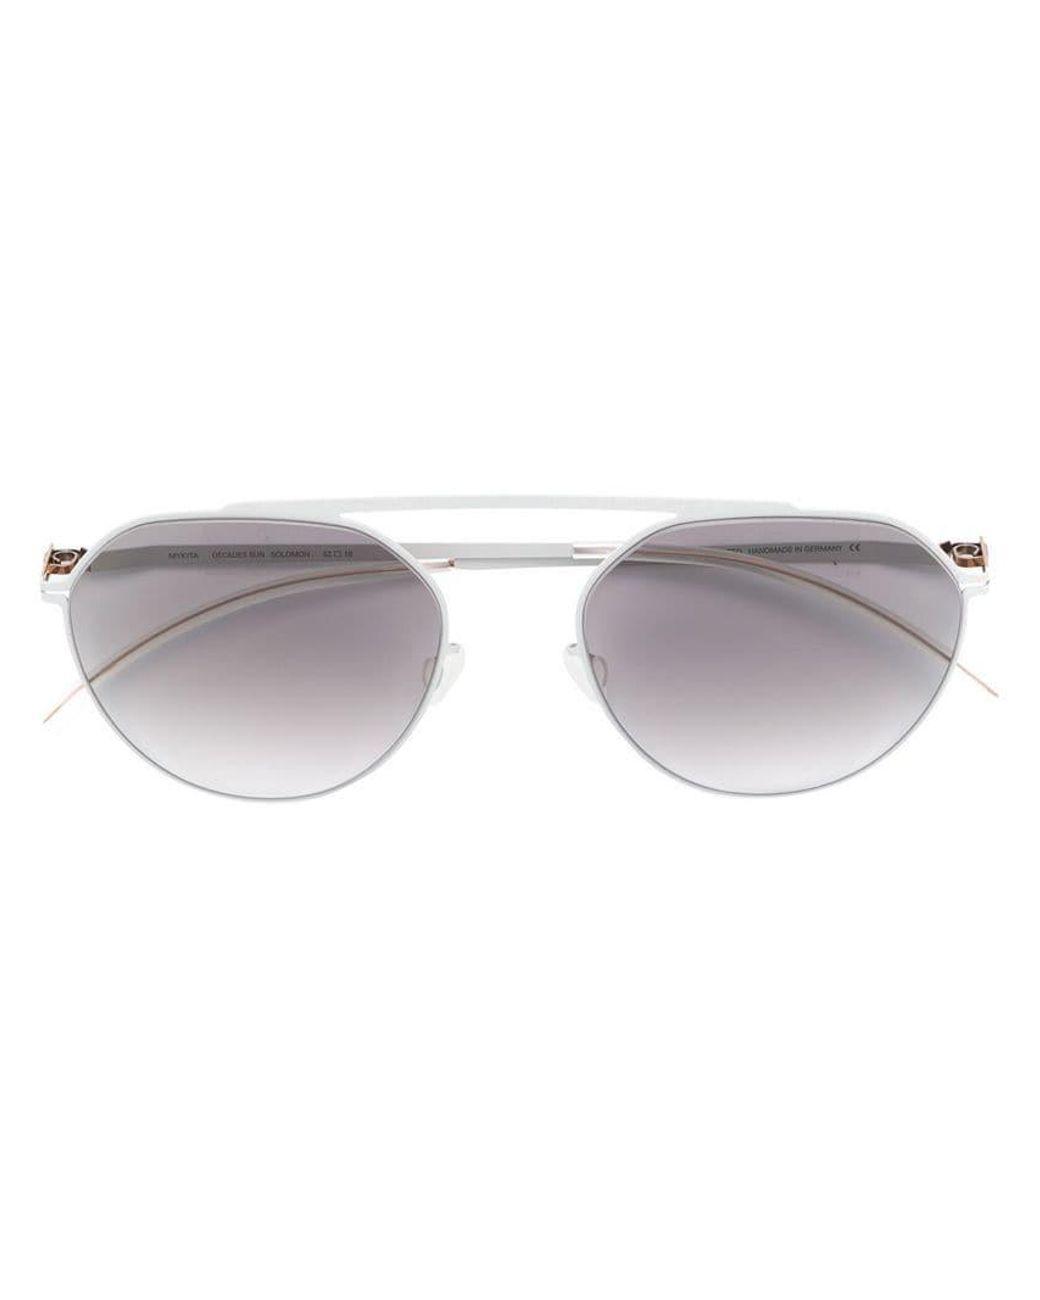 beb66648fe9f5 Mykita Solomon Round Sunglasses in Gray - Lyst